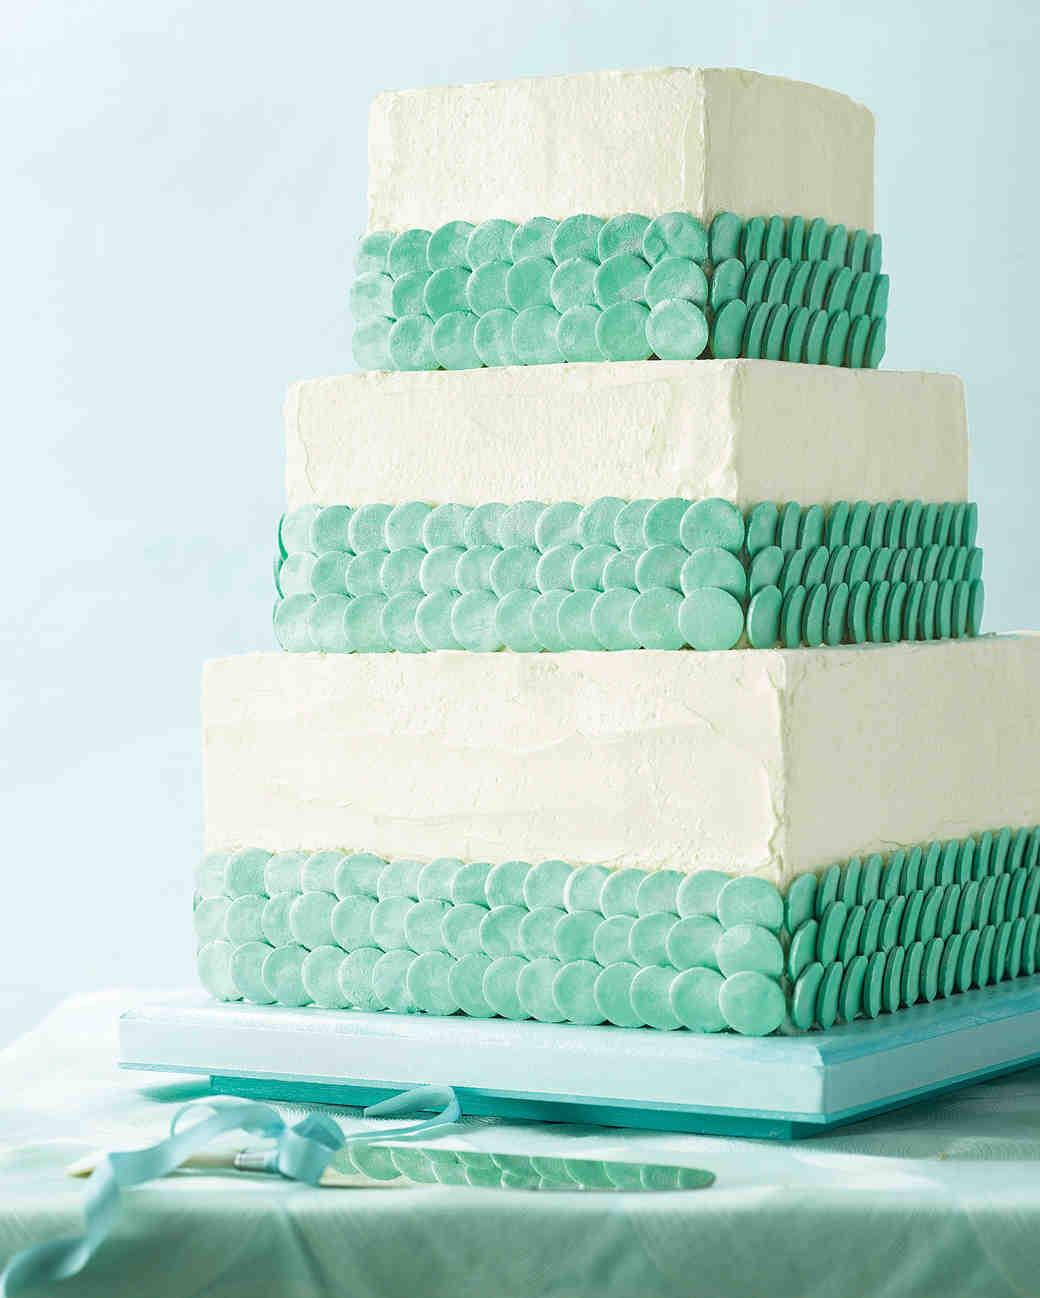 beach-wedding-cakes-mwd104718-wafer-0615.jpg